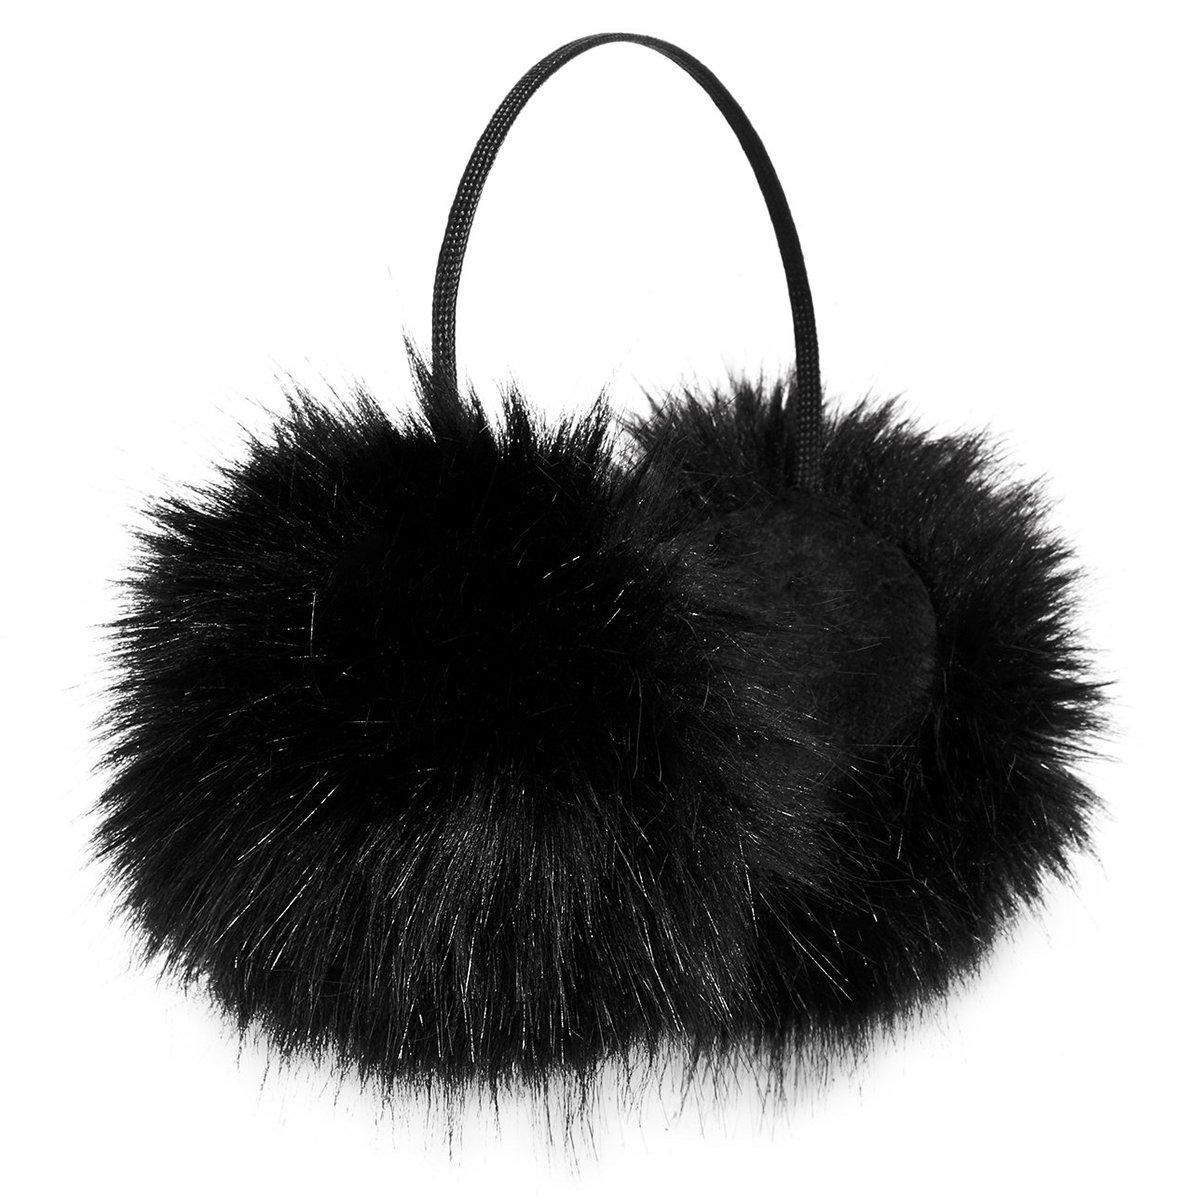 Betsey Johnson xox Trolls Faux-Fur Ear Muffs, Black